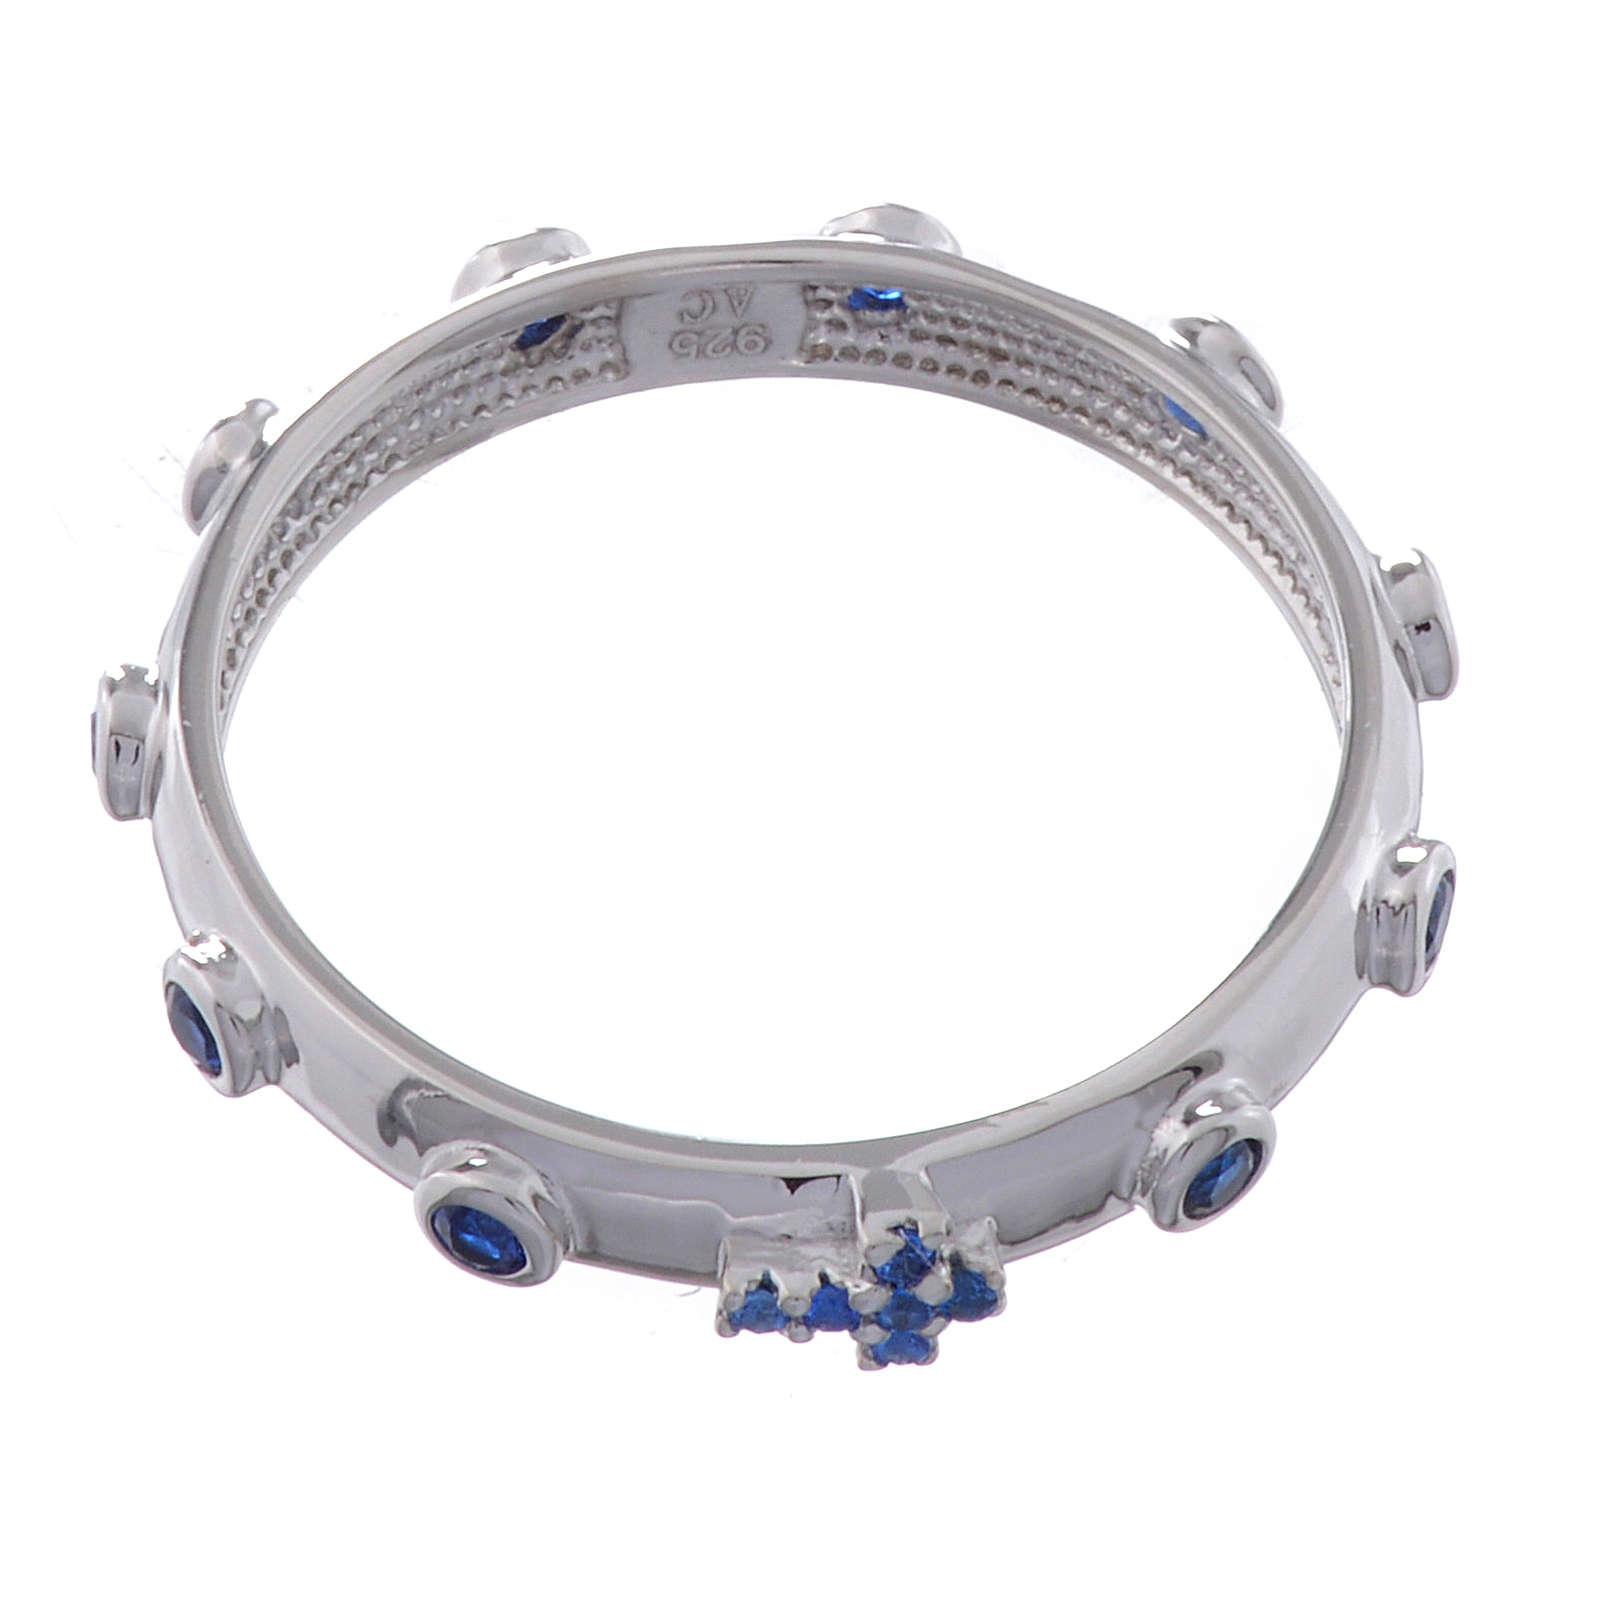 Rosary Ring AMEN rhodium-plated silver 925, blue zircons 3